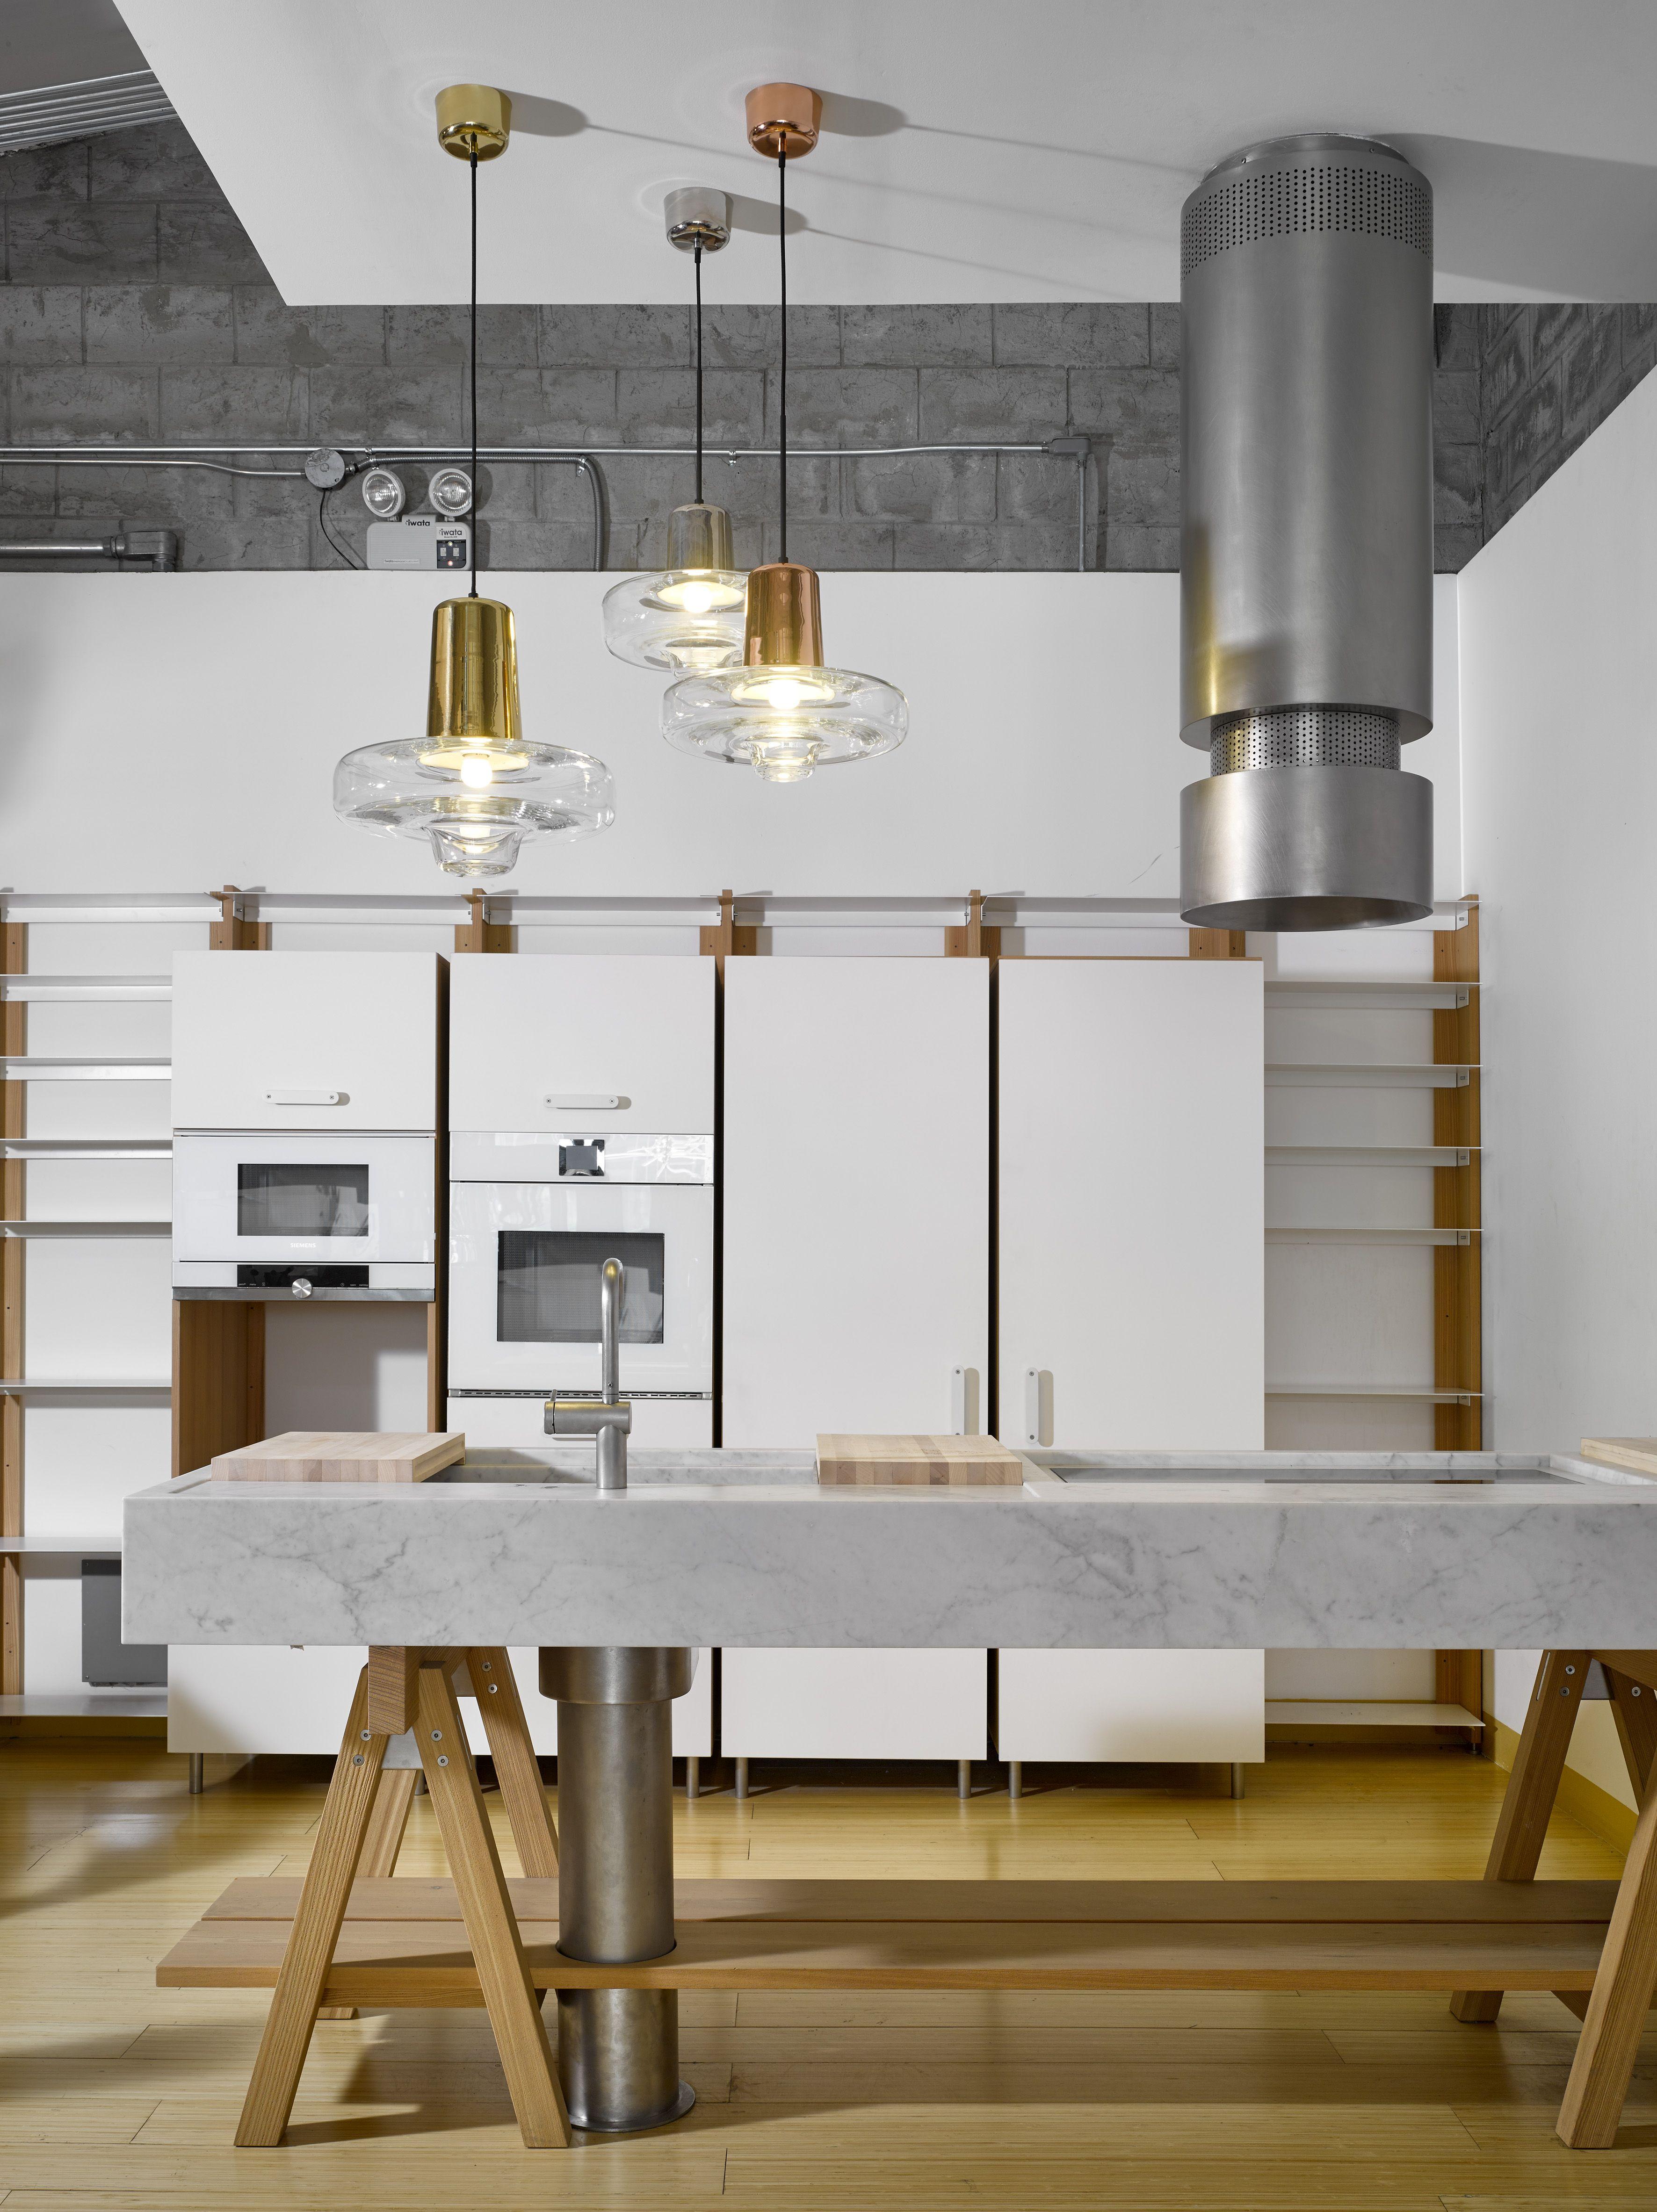 Spin Light Pendants By Lasvit Designed Lucie Koldov At CWC Interiors Showroom In Manila